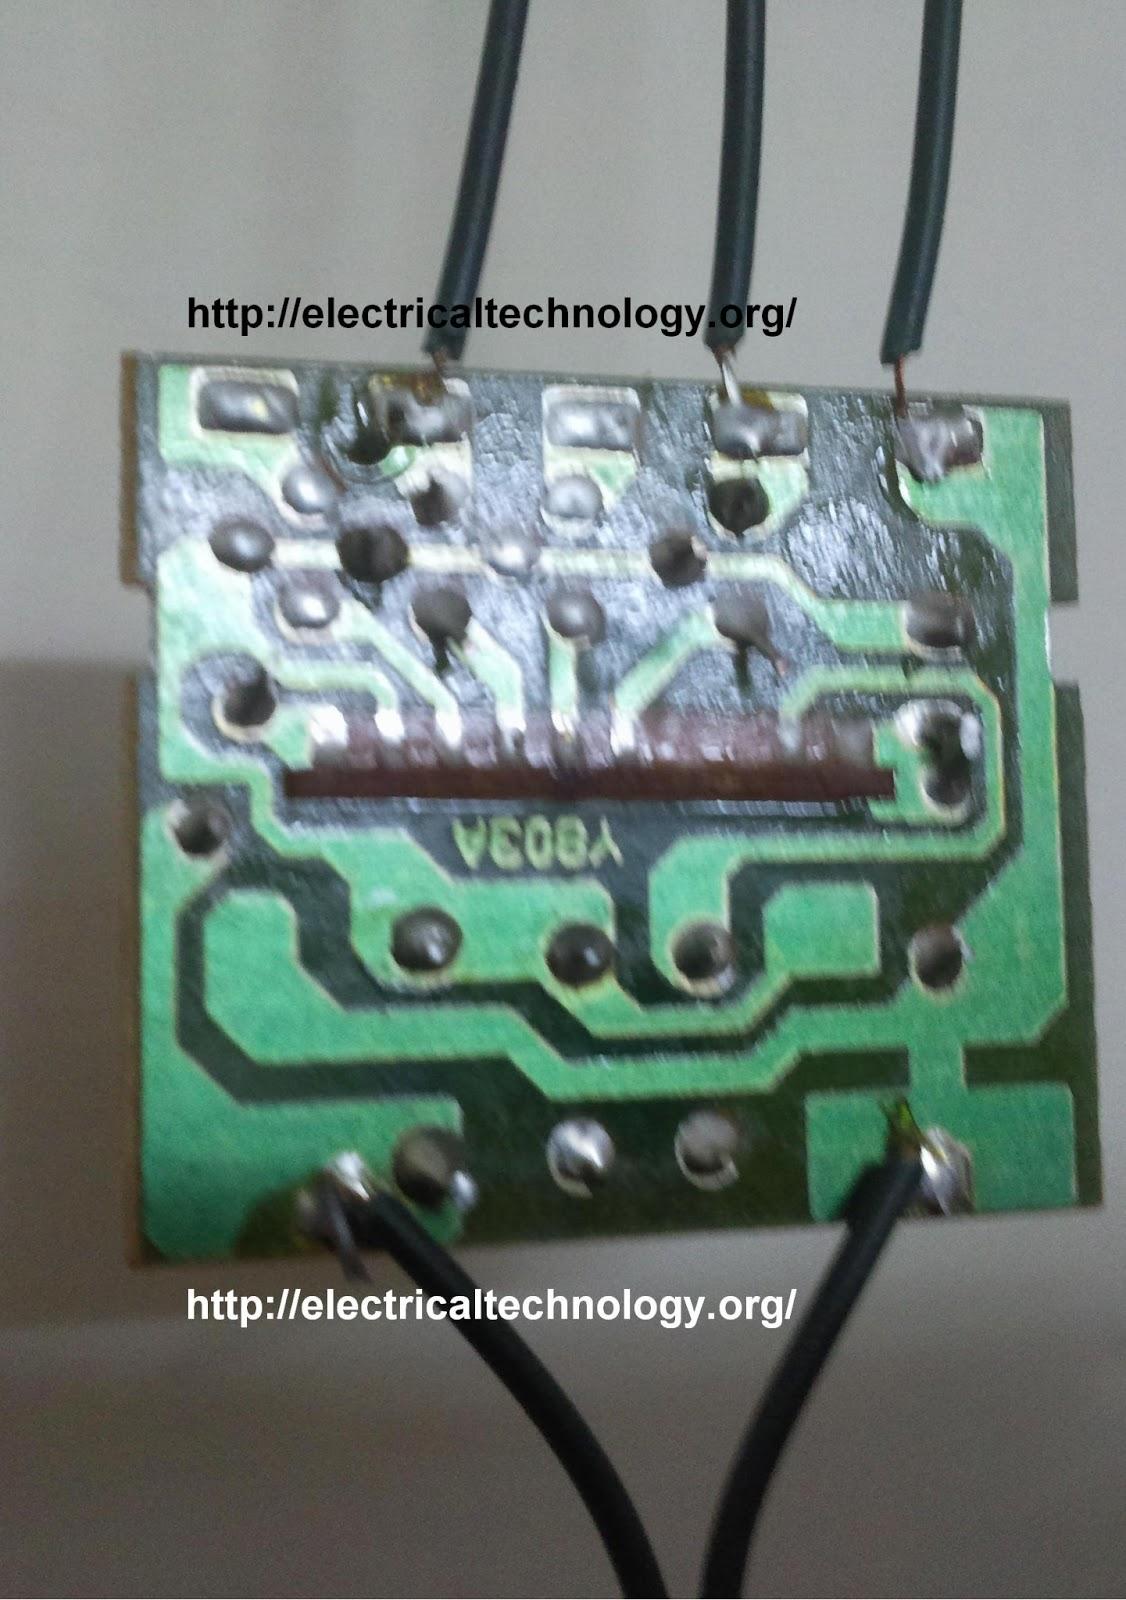 Led Stringstrip Circuit Diagram Using Pcr Httpwww Electricaltechnology Org on Box Step Dance Diagram